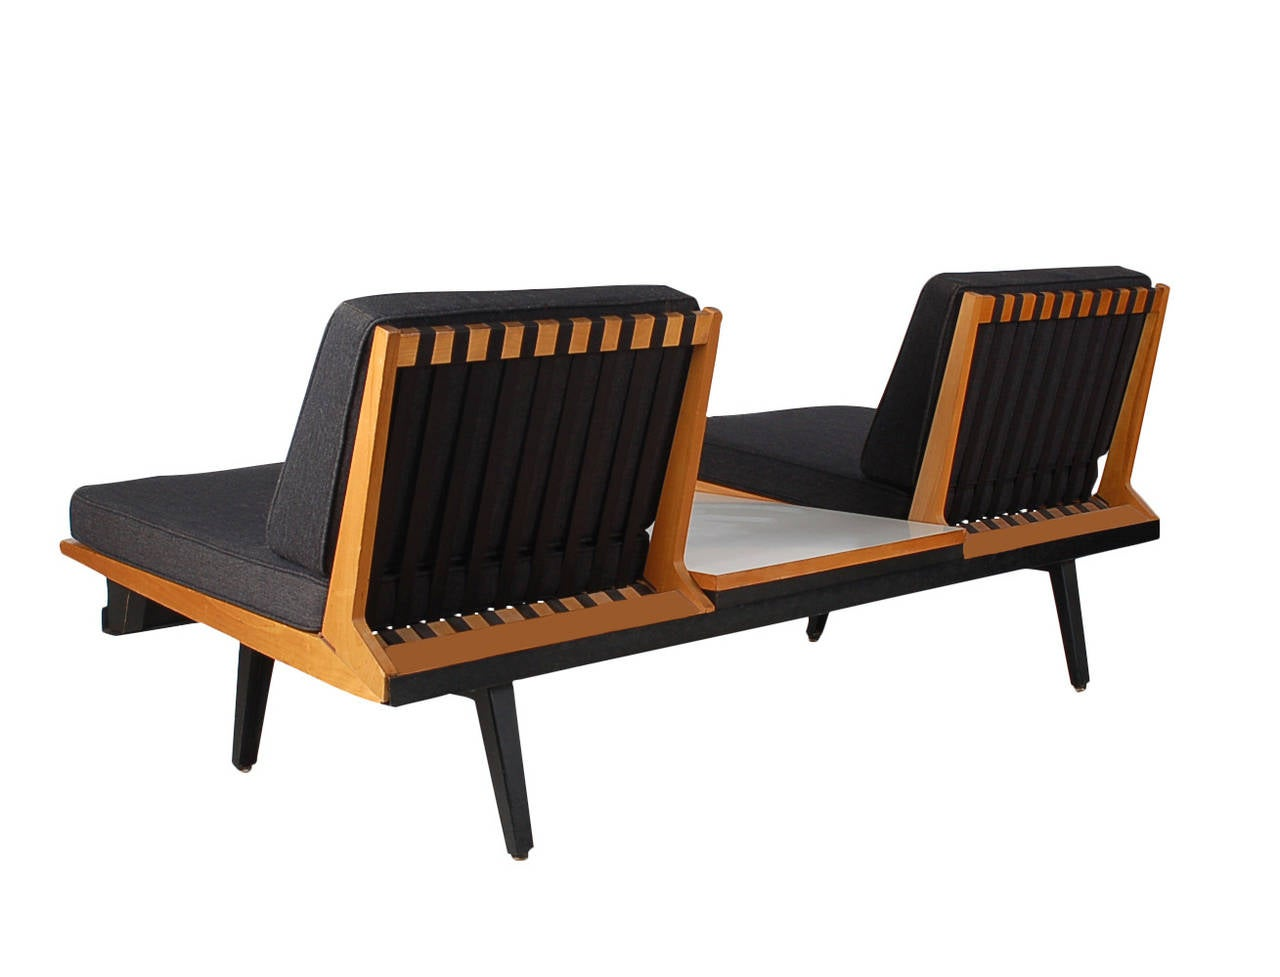 George nelson herman miller steel frame modular sofa and for Modular a frame